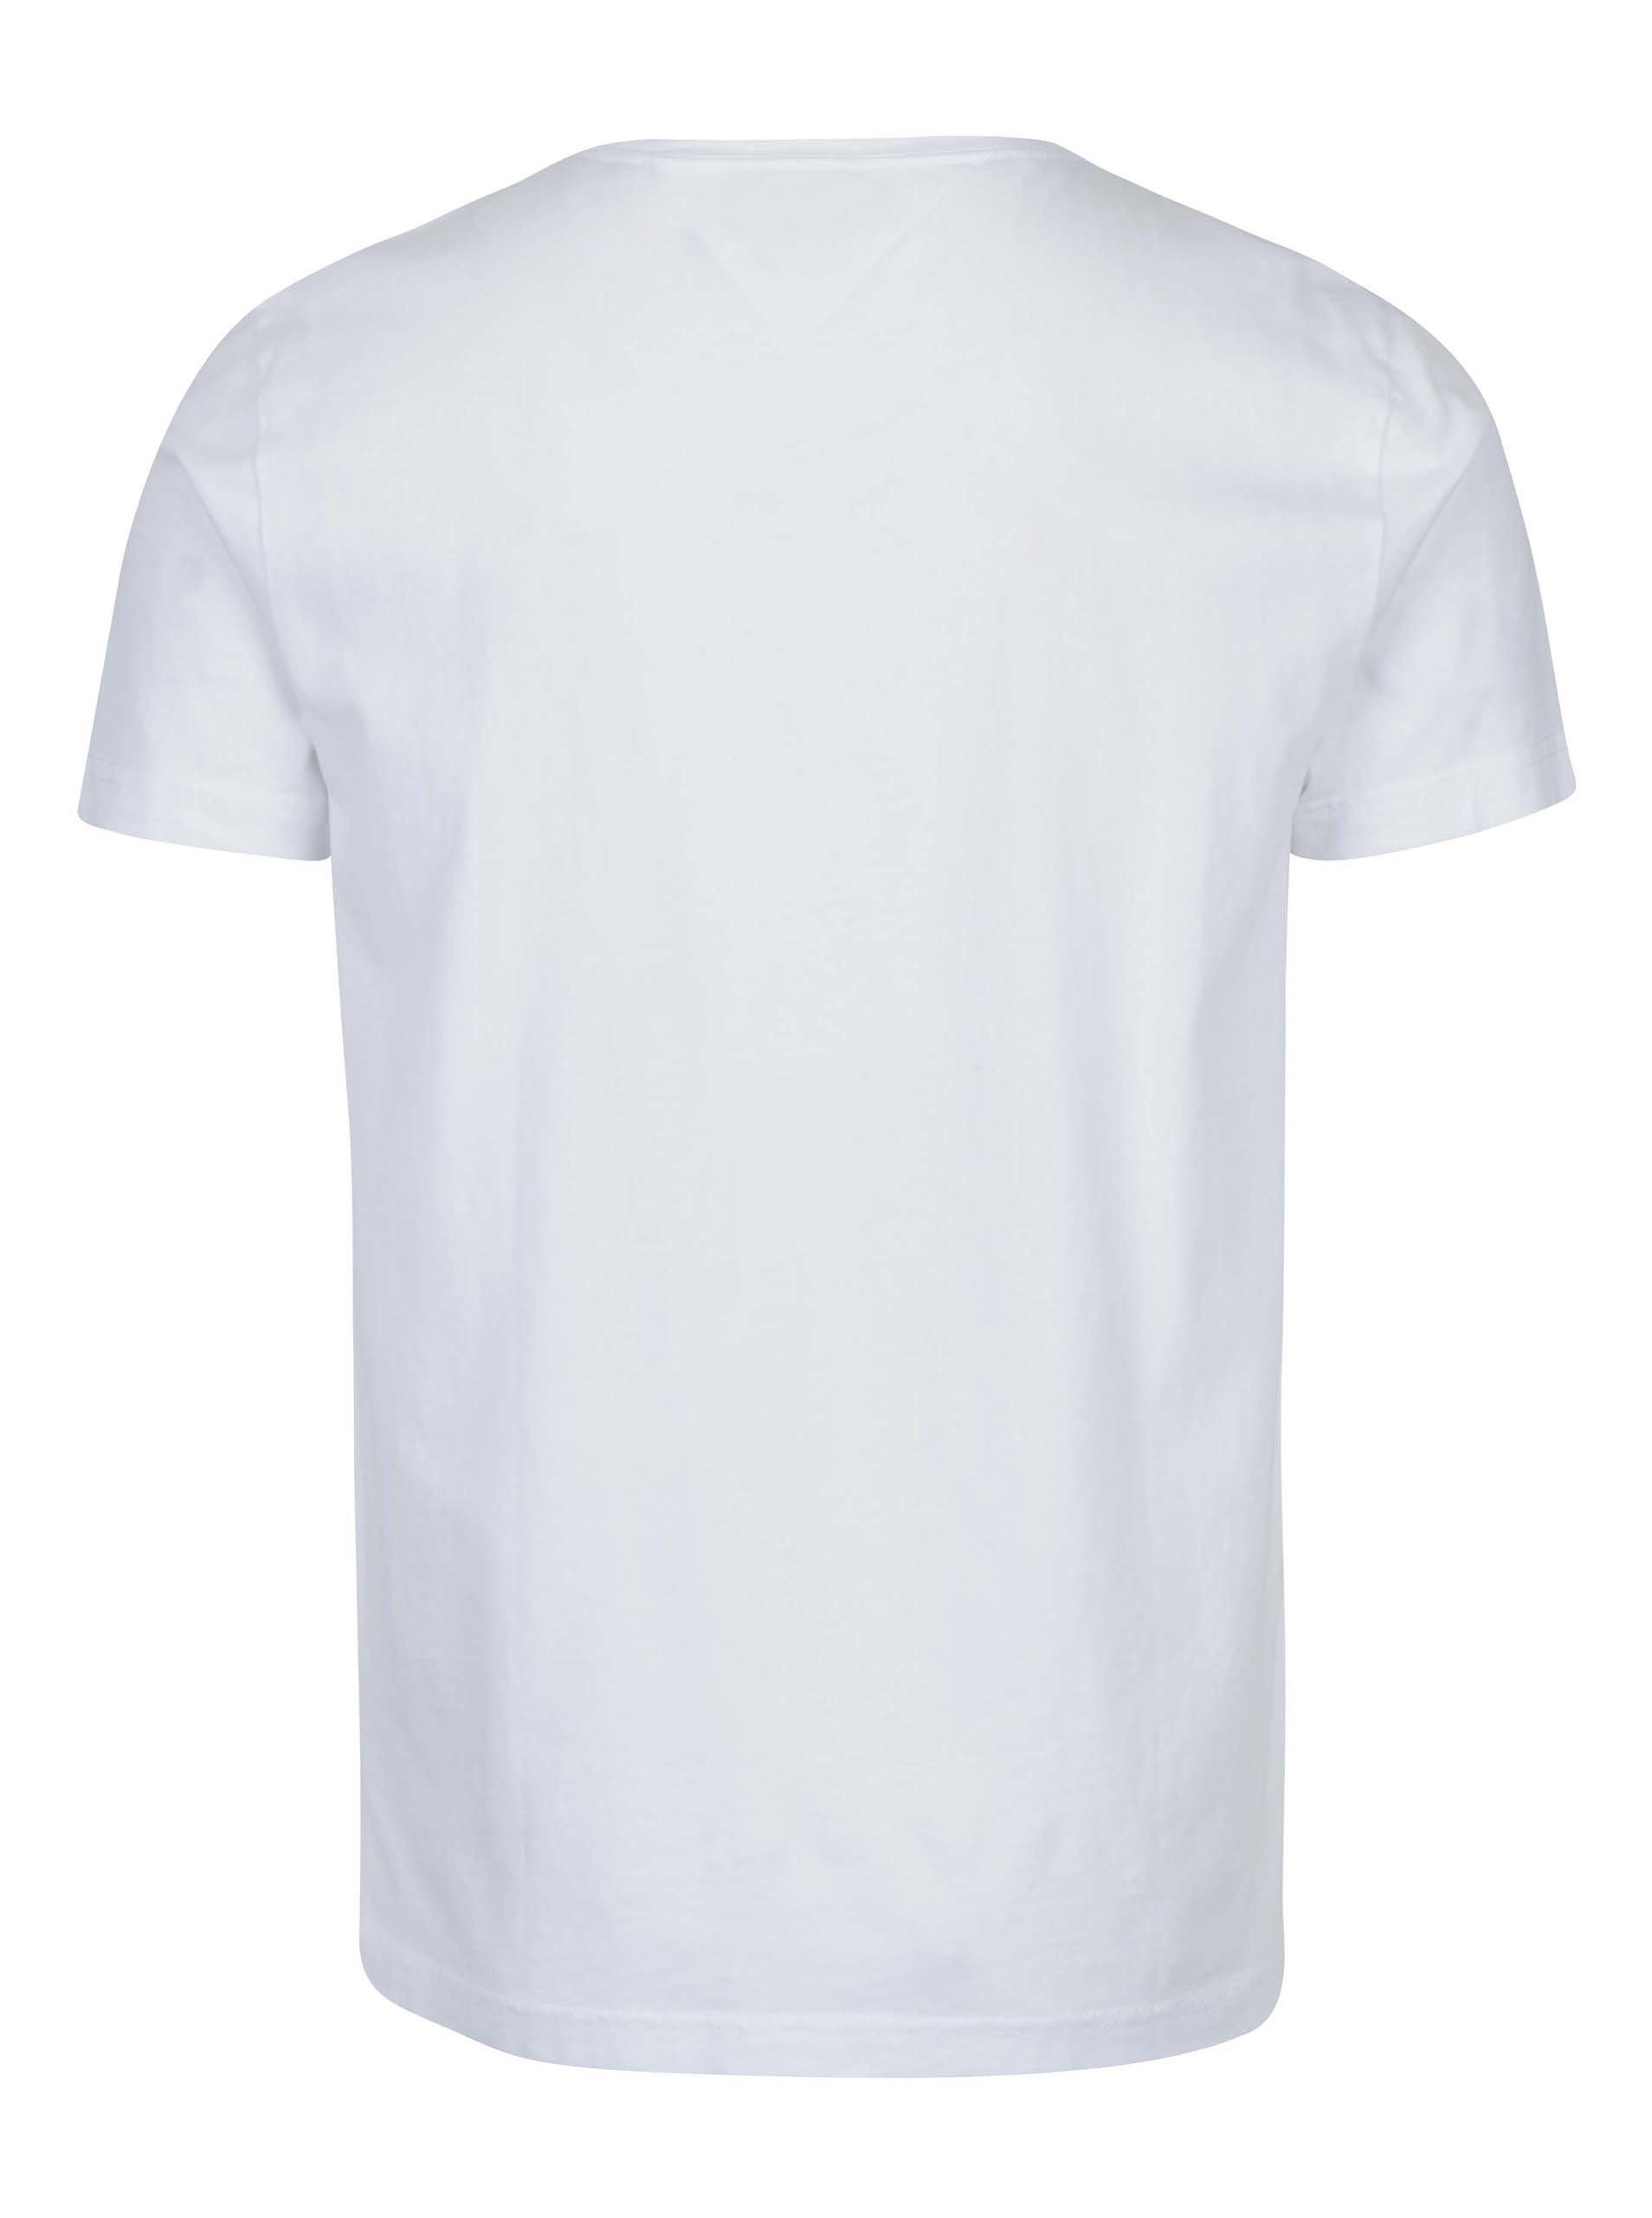 754c8ee2ab Biele pánske tričko s potlačou Tommy Hilfiger Norman ...